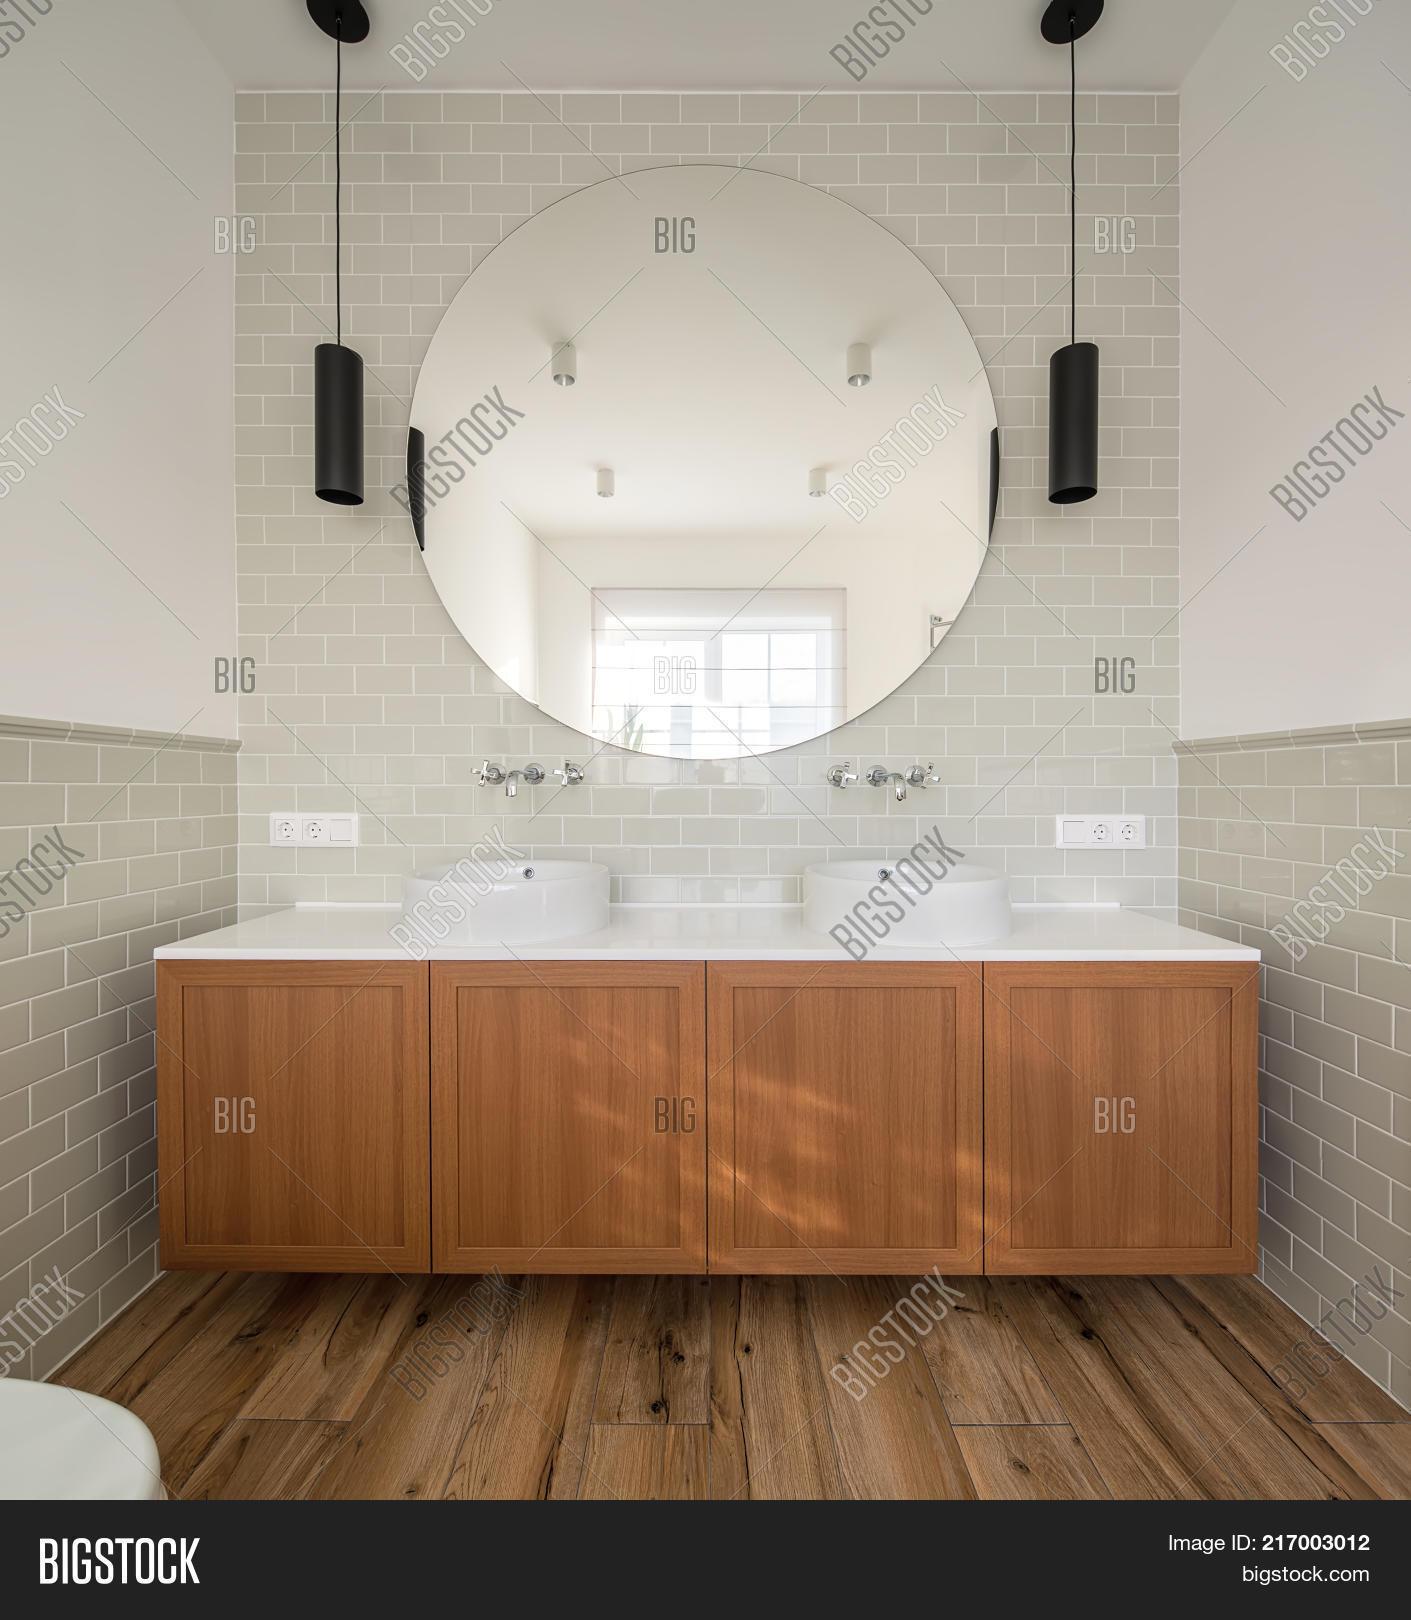 Bathroom Modern Style Image Photo Free Trial Bigstock